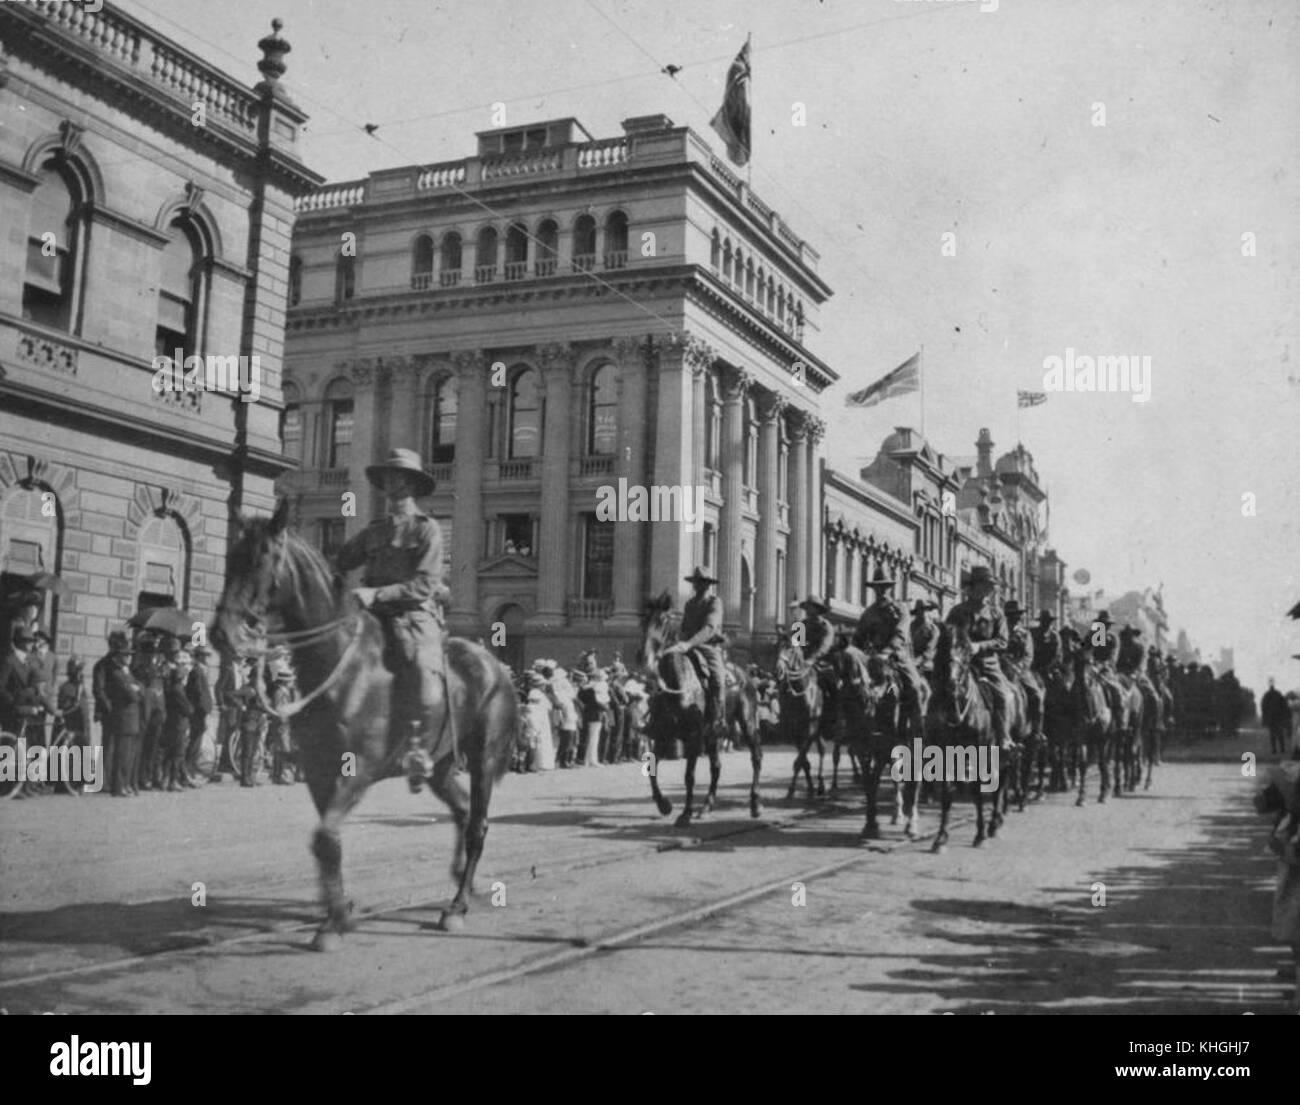 2 239957 Cavalry parade along Queen Street, Brisbane, ca. 1914 - Stock Image